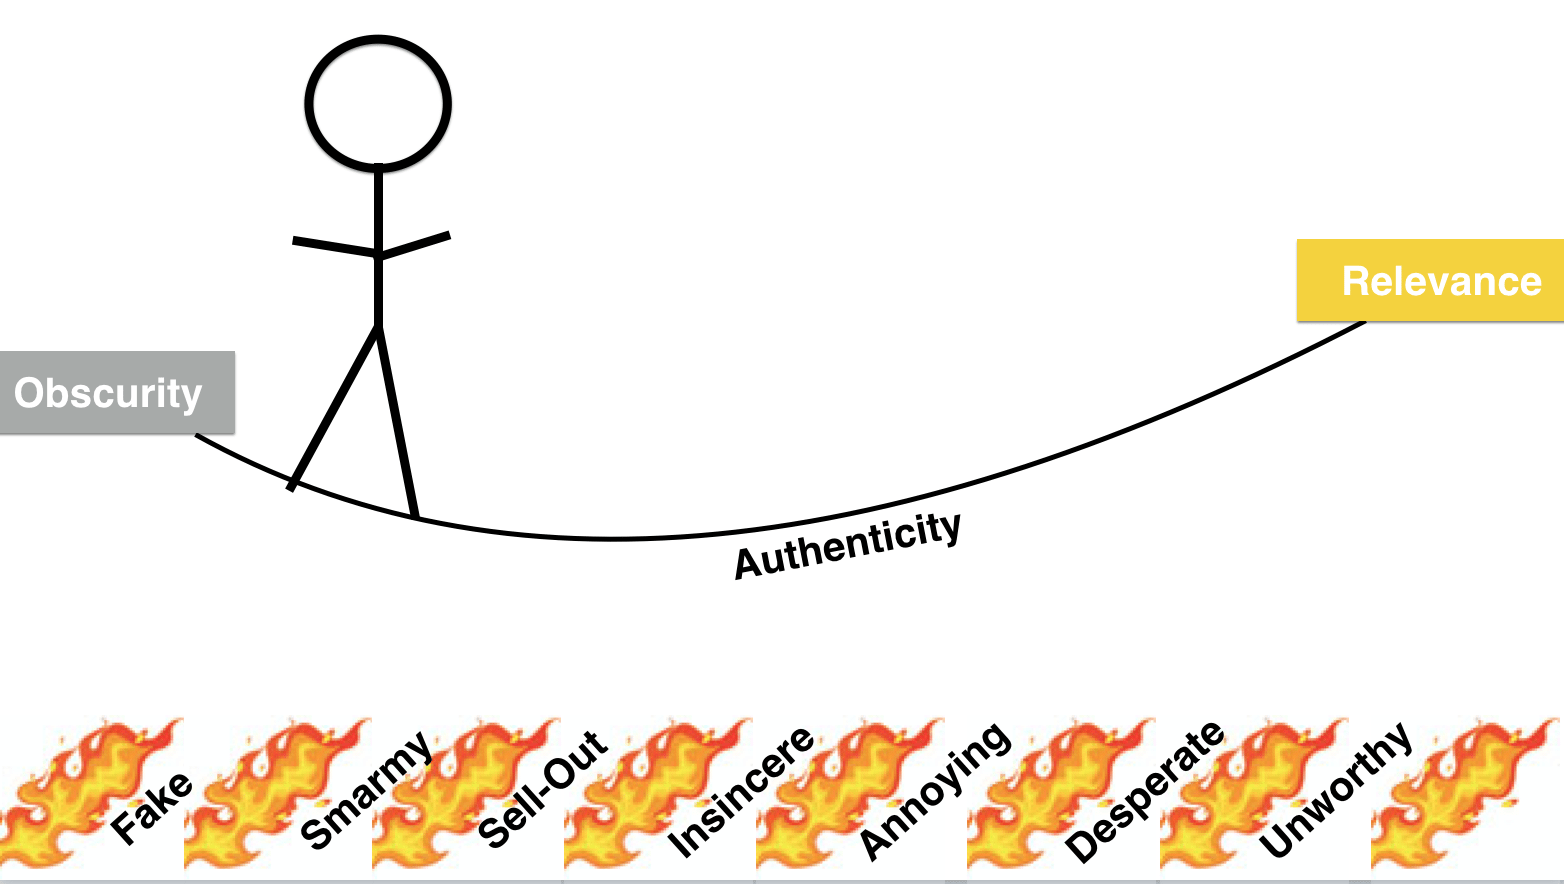 authenticity, authenticity crisis